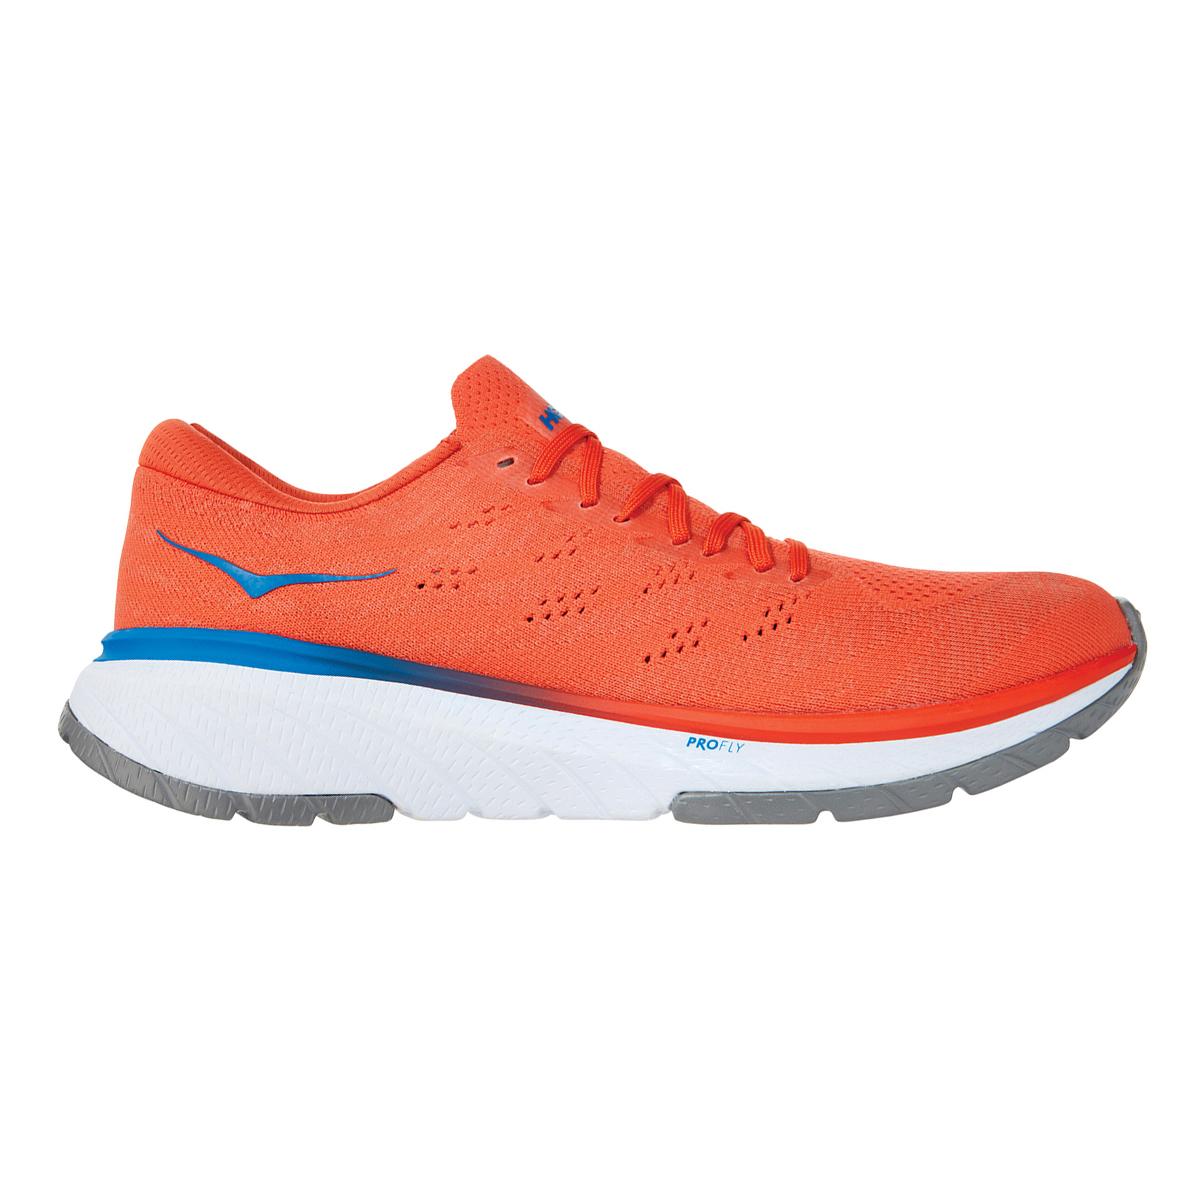 Men's Hoka One One Cavu 3 Running Shoe - Color: Mandarin Red/White - Size: 7 - Width: Regular, Mandarin Red/White, large, image 1